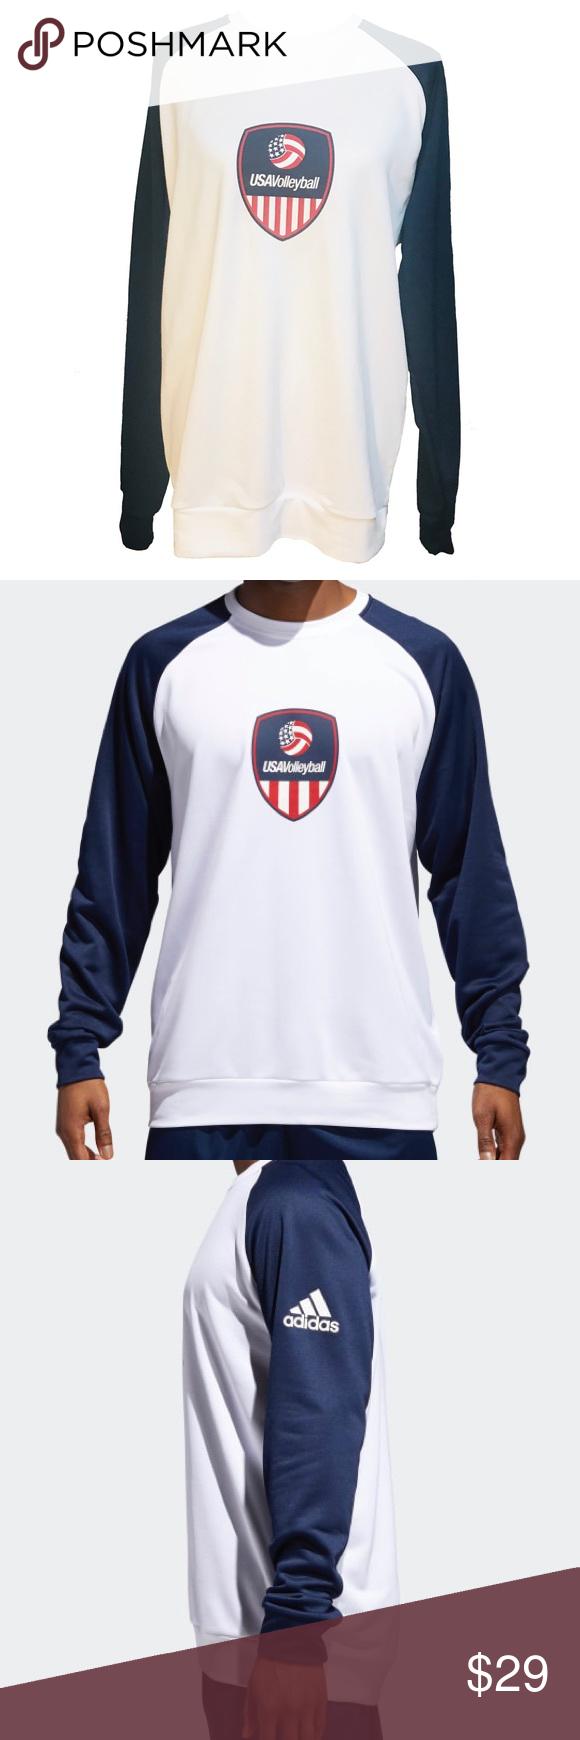 Adidas Usa Volleyball Sweatshirt White New Volleyball Sweatshirts Sweatshirts Crew Neck Sweatshirt